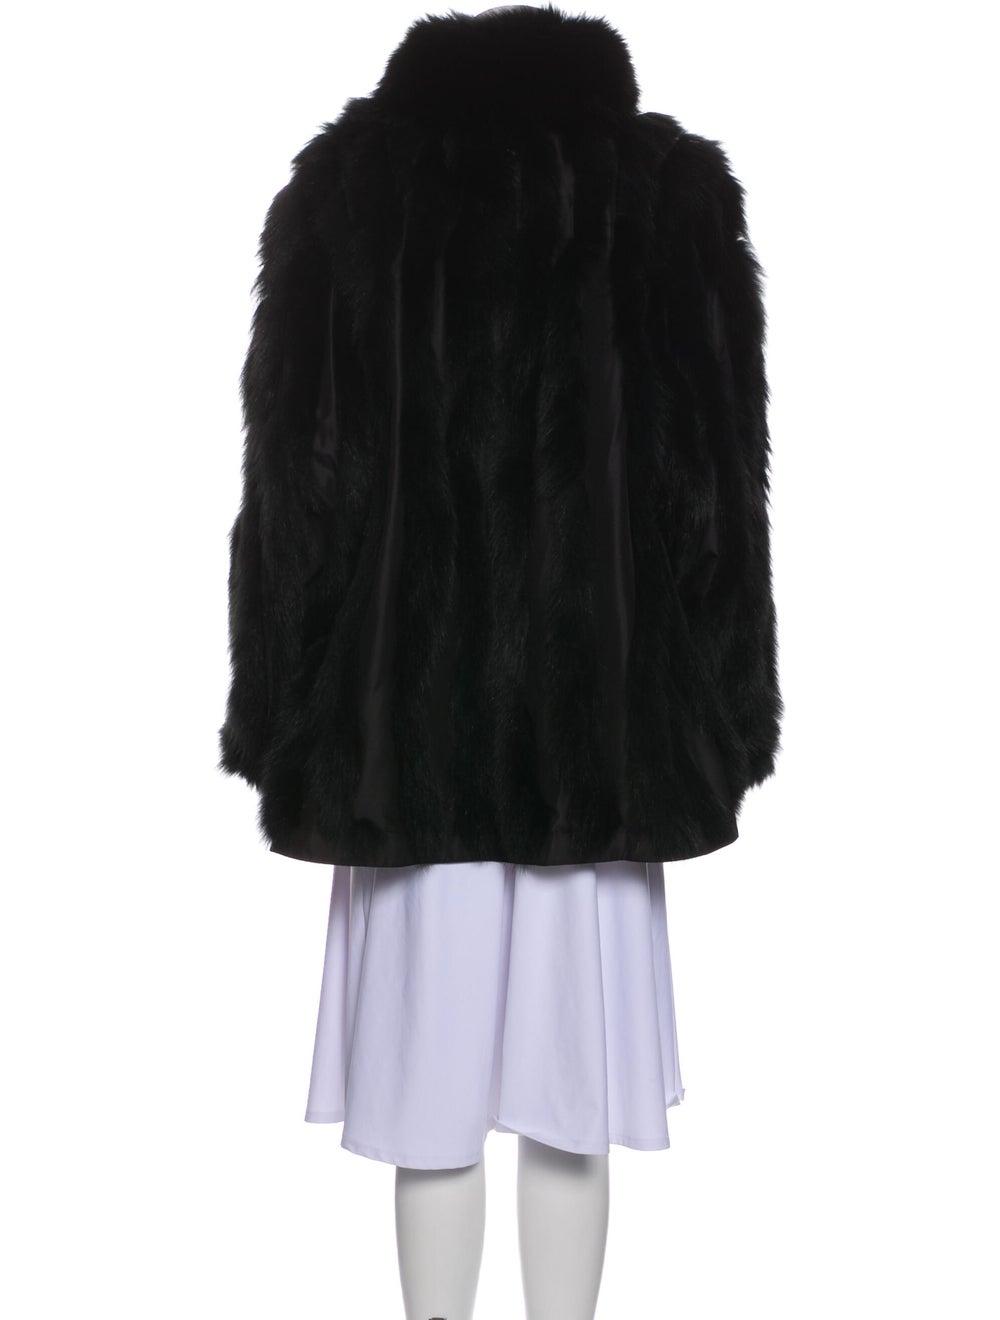 Fur Coat Black - image 3